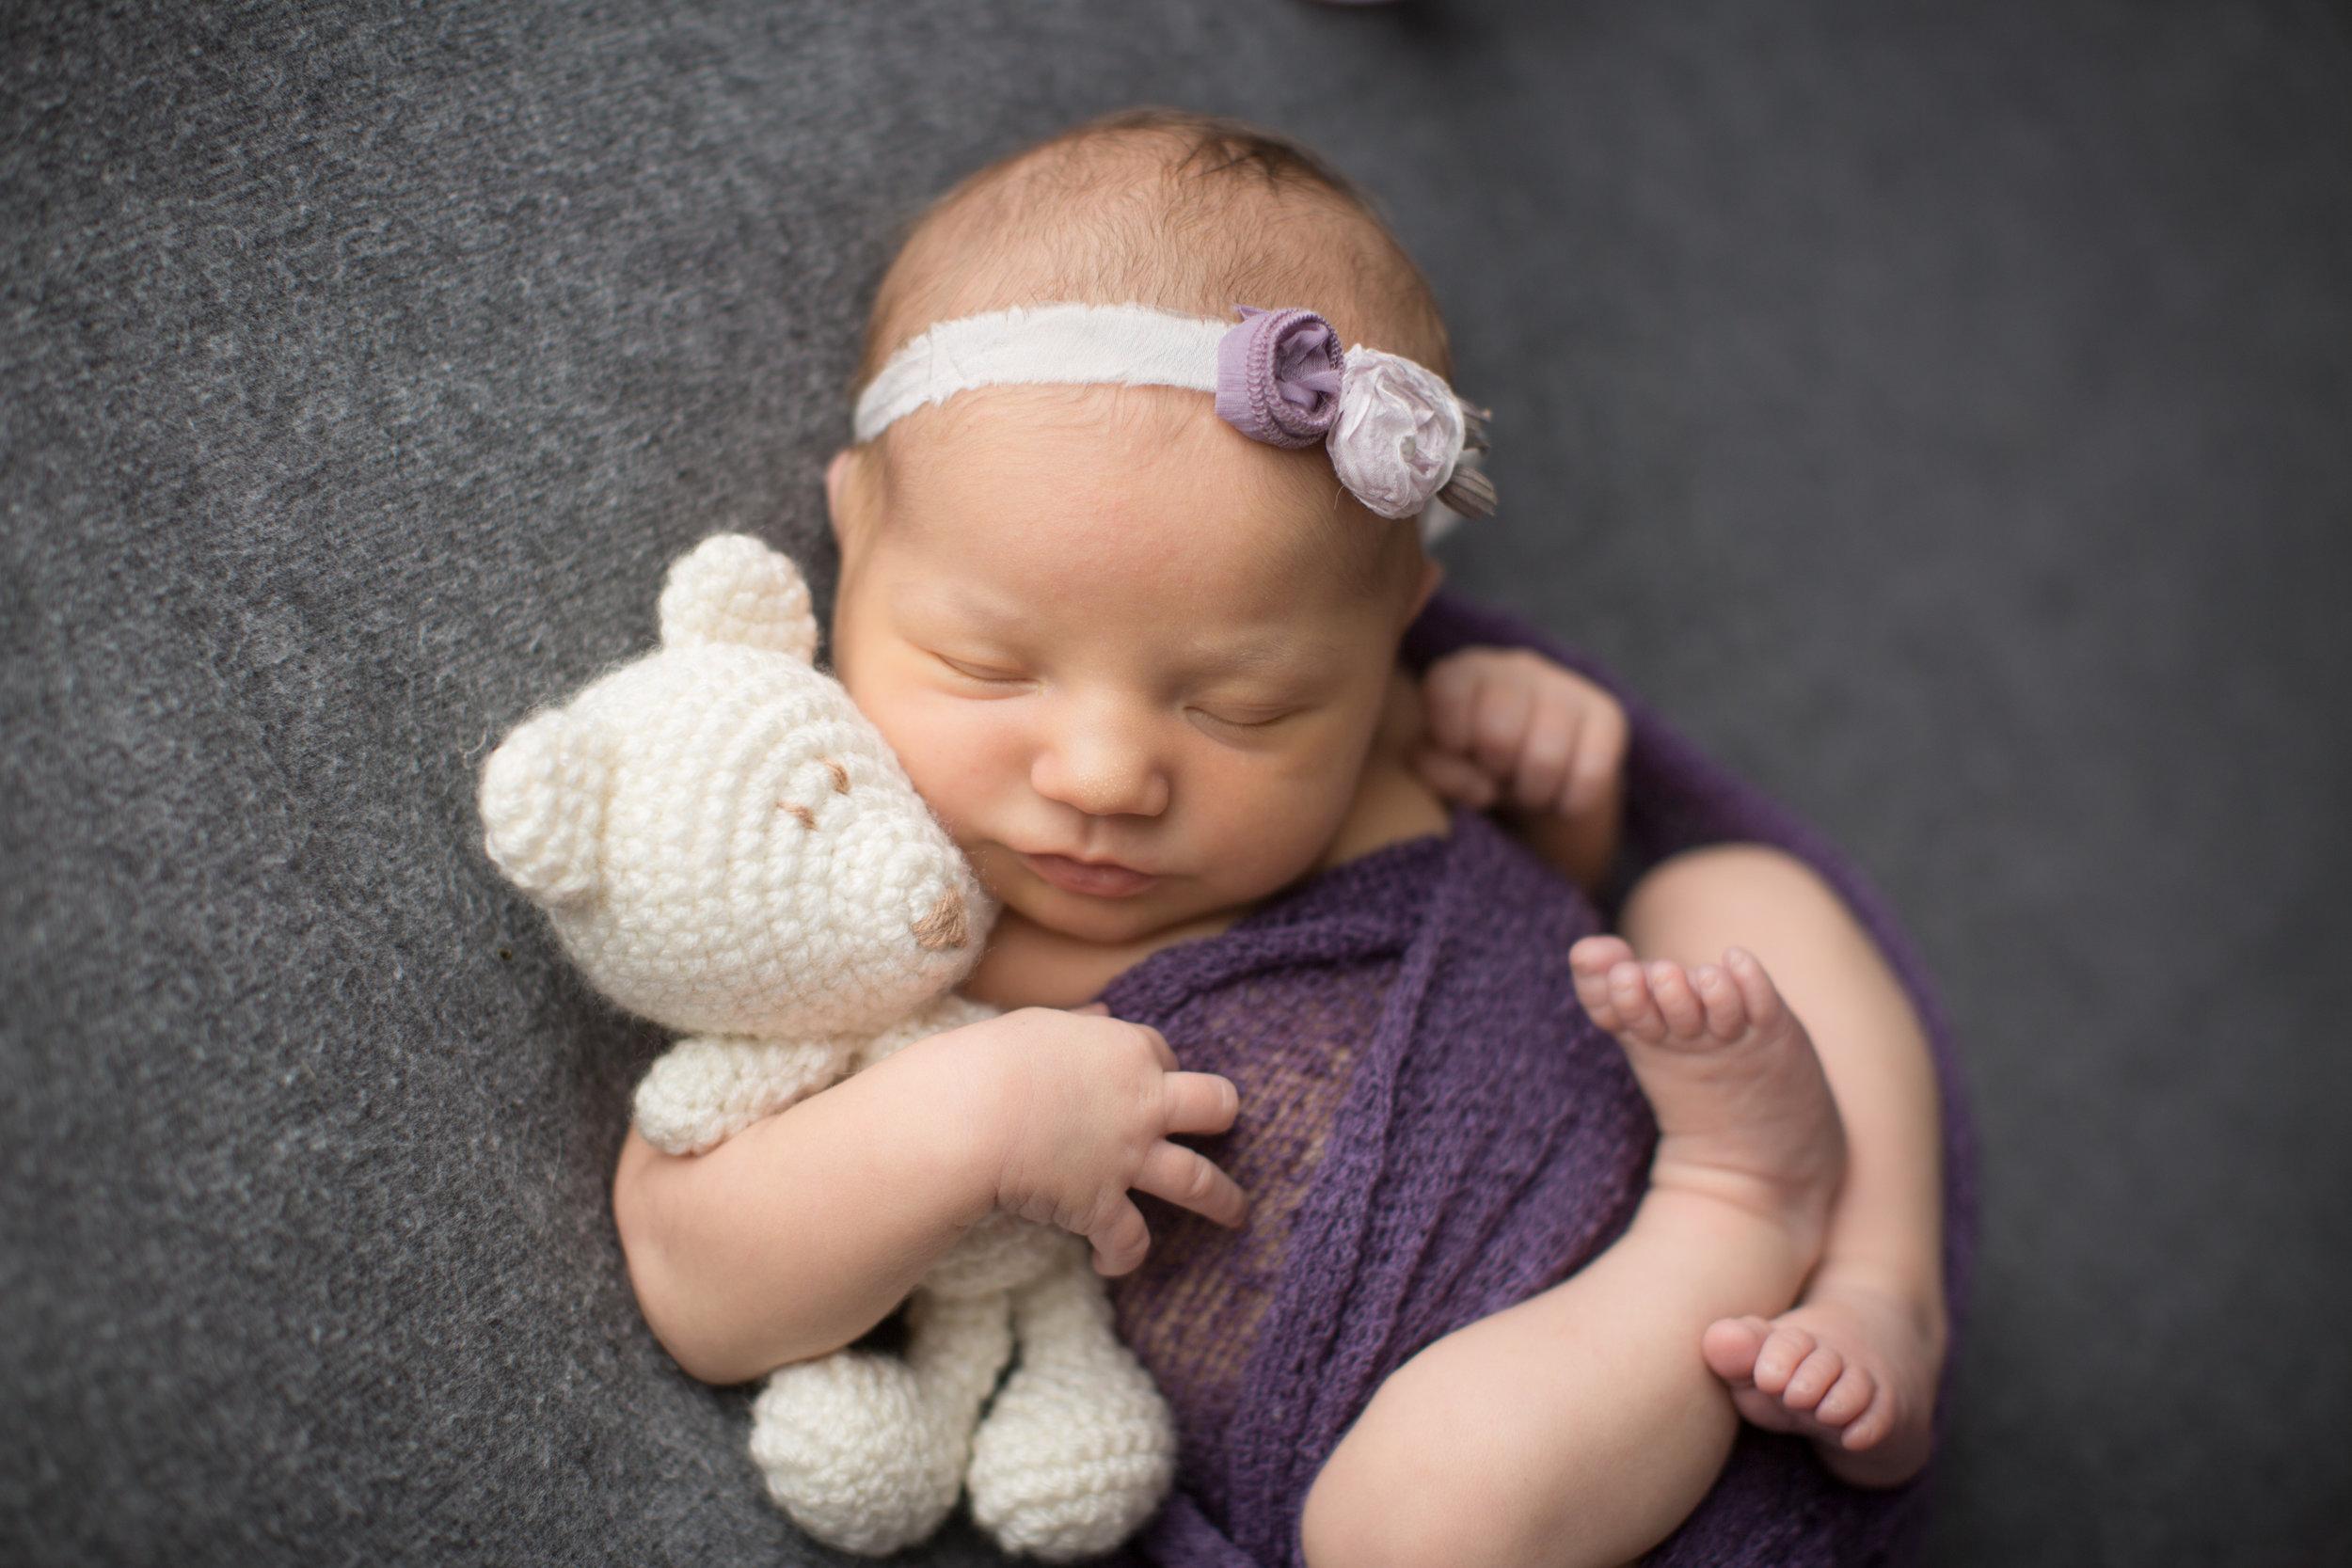 professional portrait of a newborn baby girl holding a teddy bear